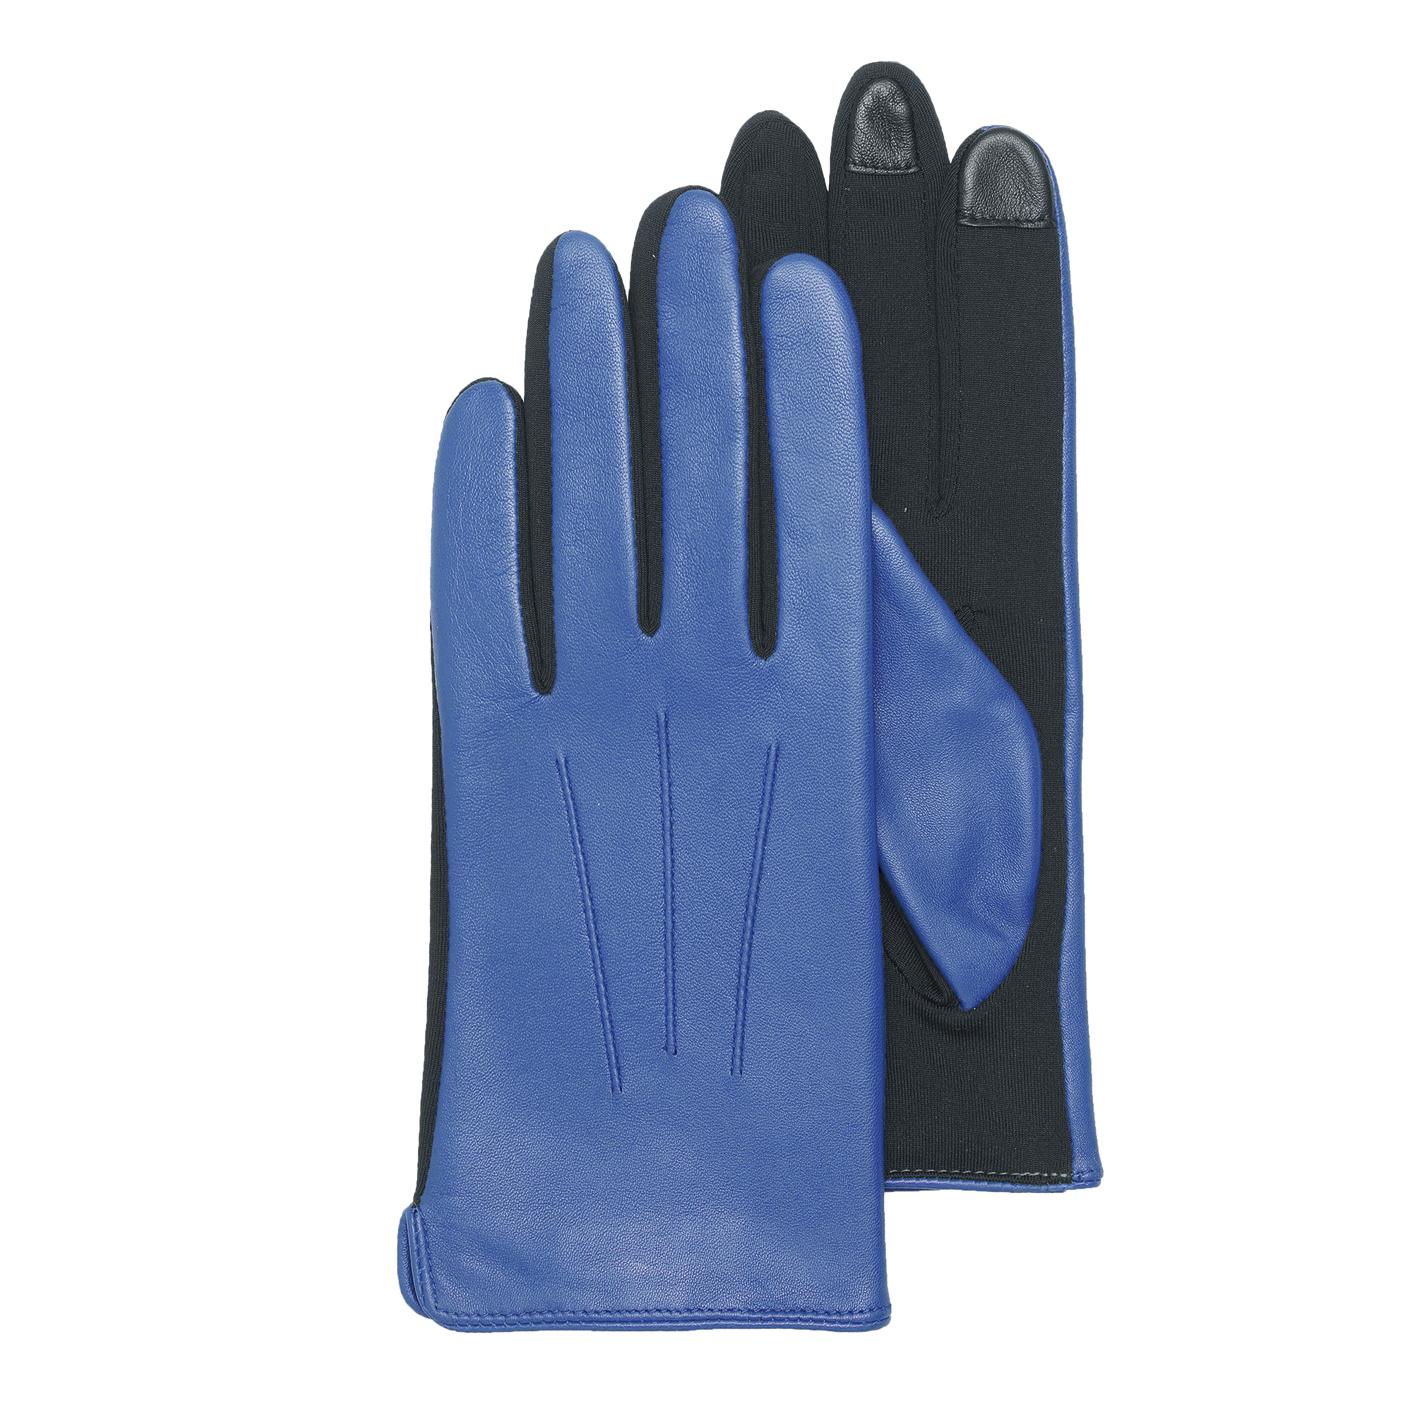 Mia 184 denim blue